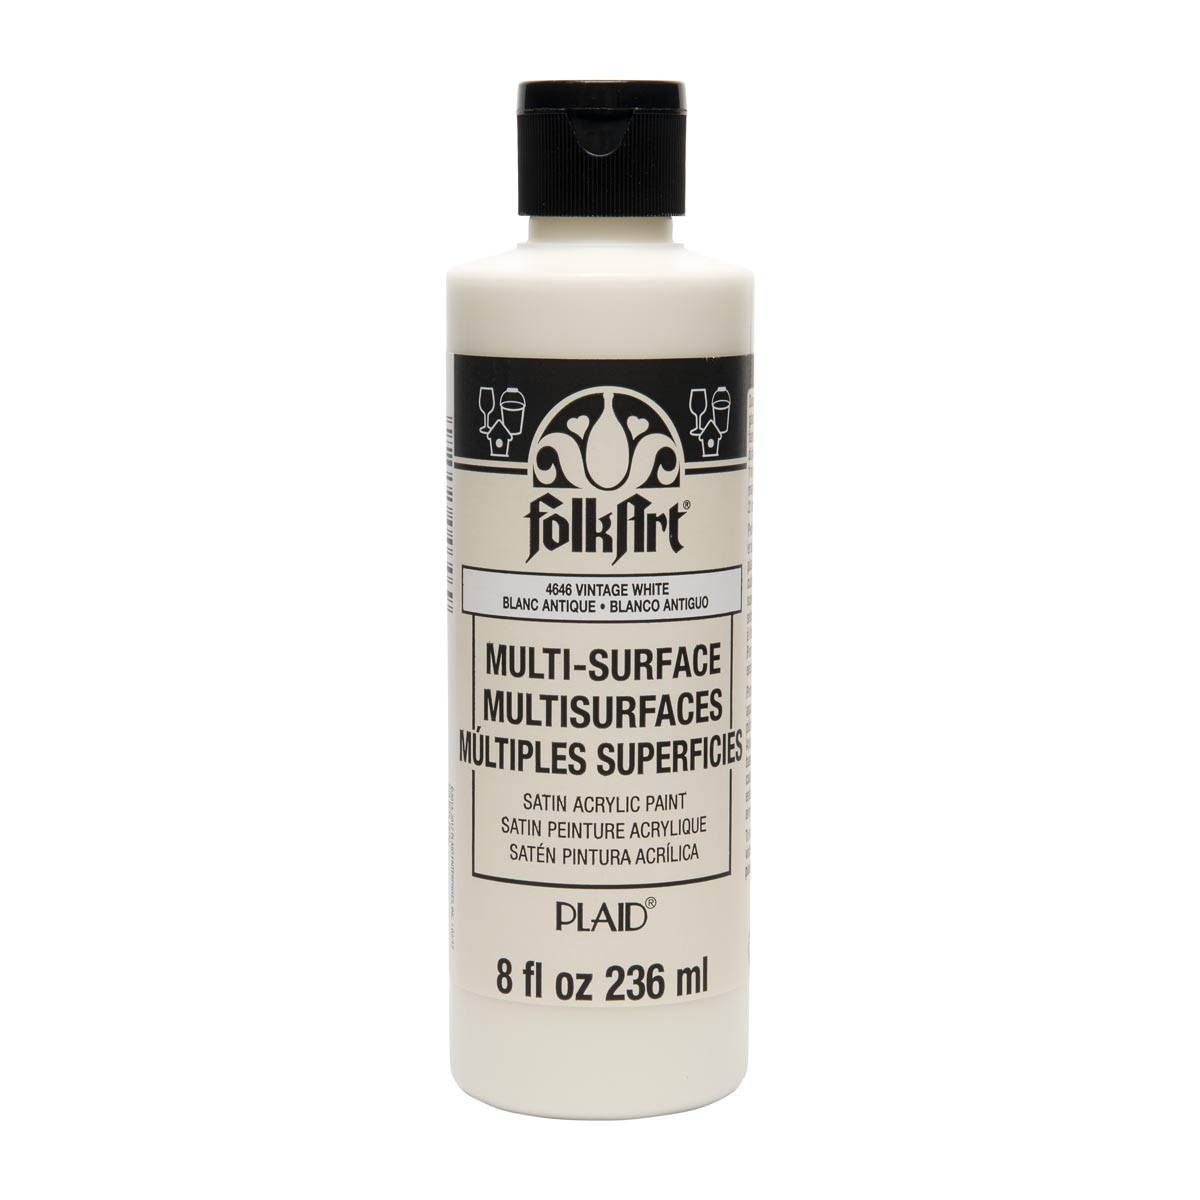 FolkArt ® Multi-Surface Satin Acrylic Paints - Vintage White, 8 oz. - 4646